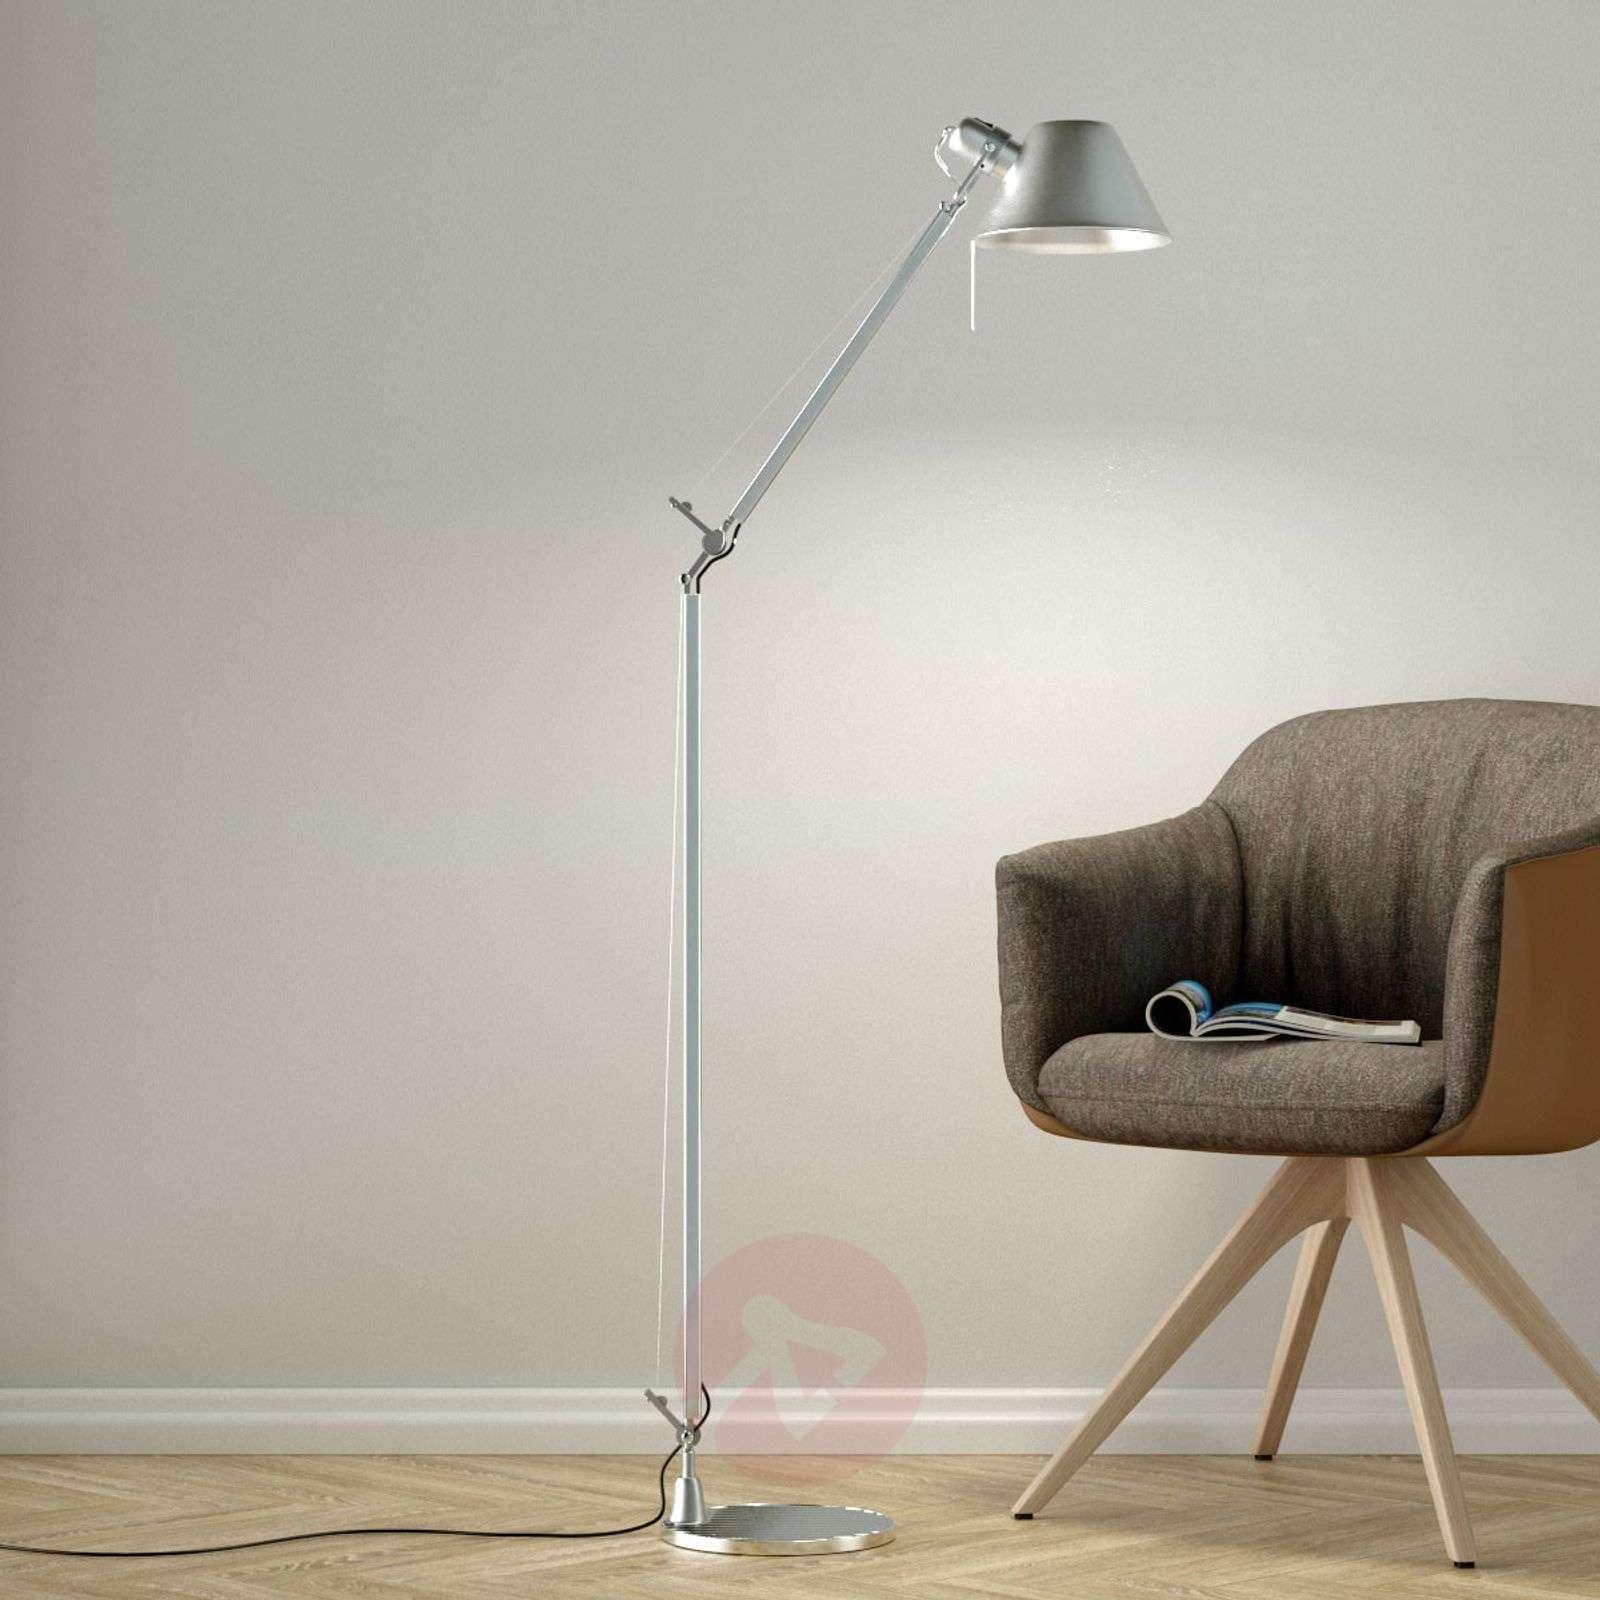 Tolomeo Reading Floor flexible floor lamp-1060091-05